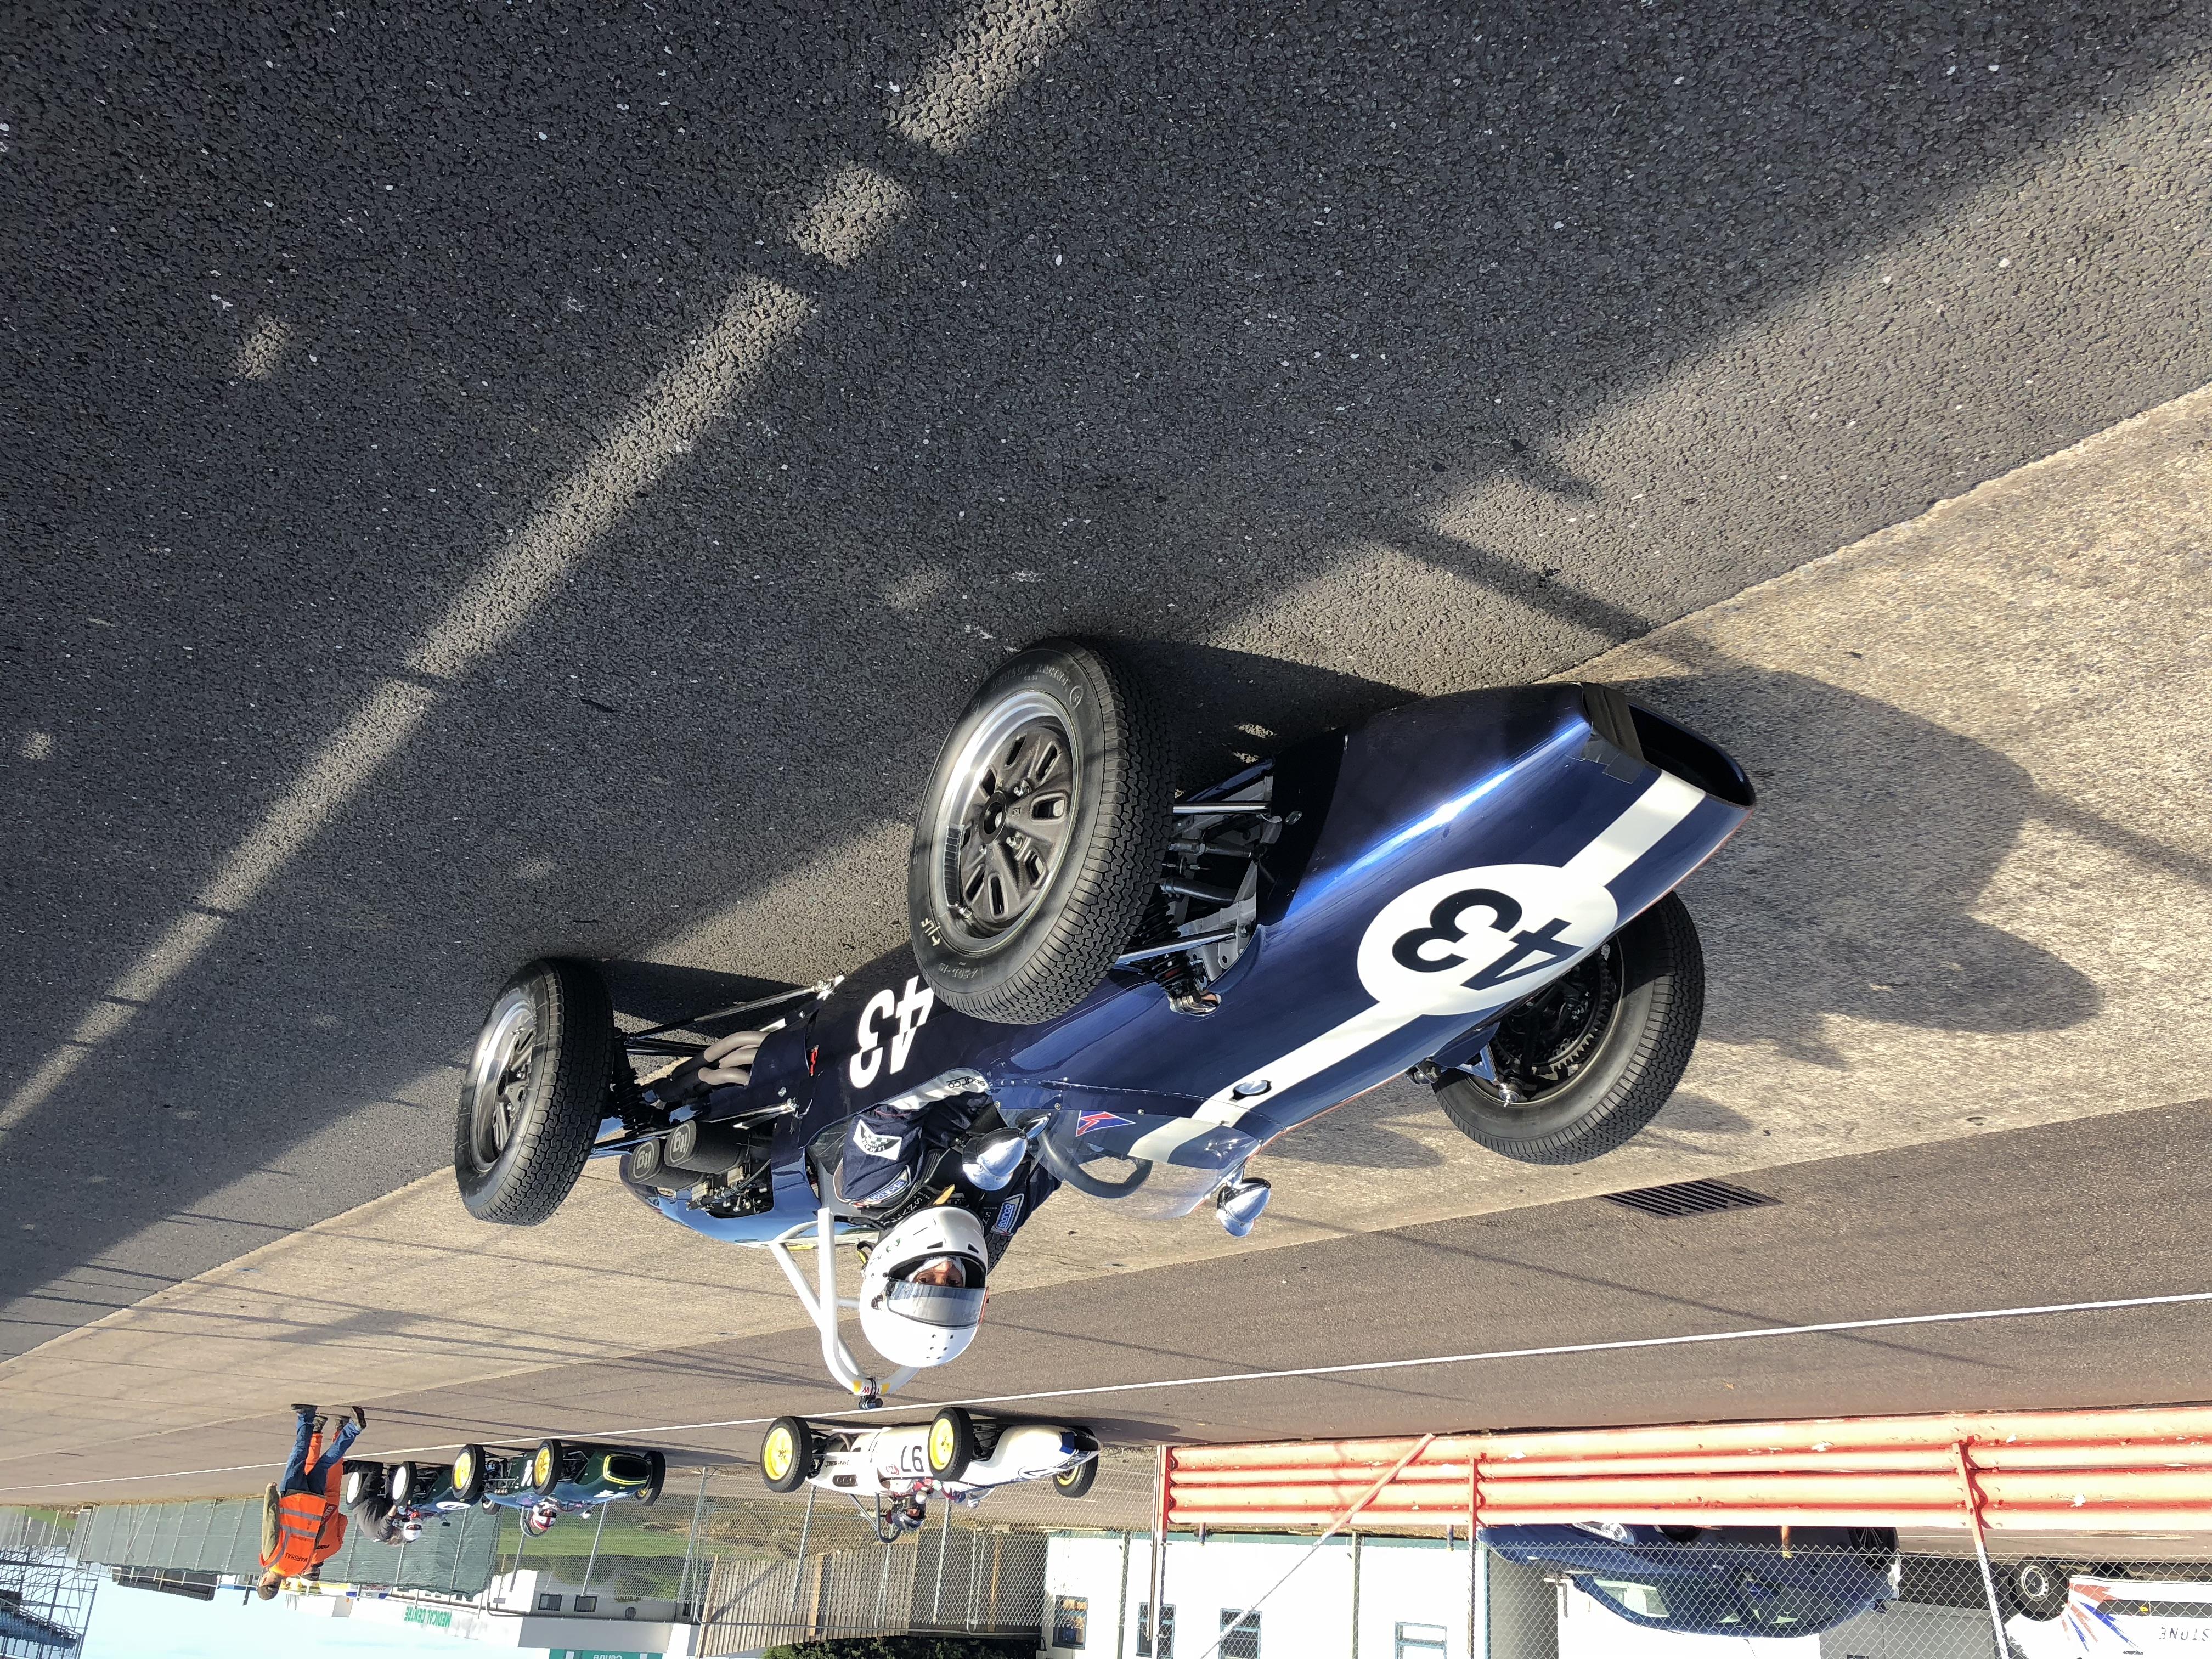 Ian Simmonds - Silverstone 2018